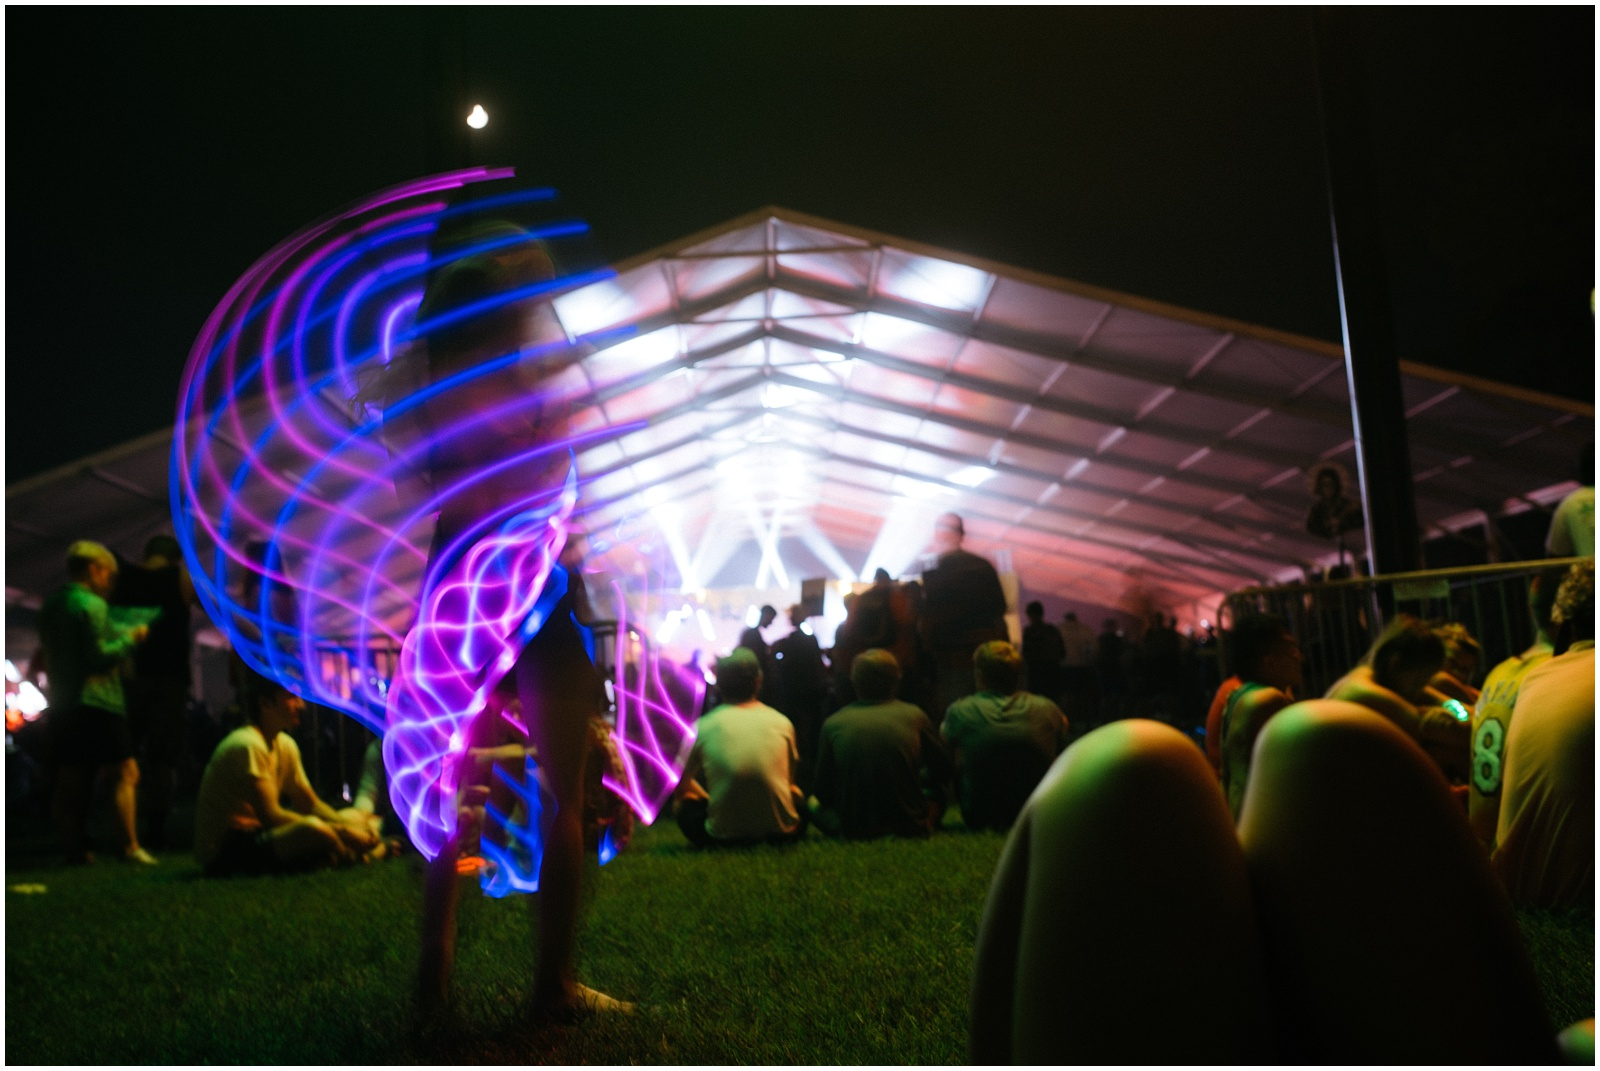 Night show long shutter speed